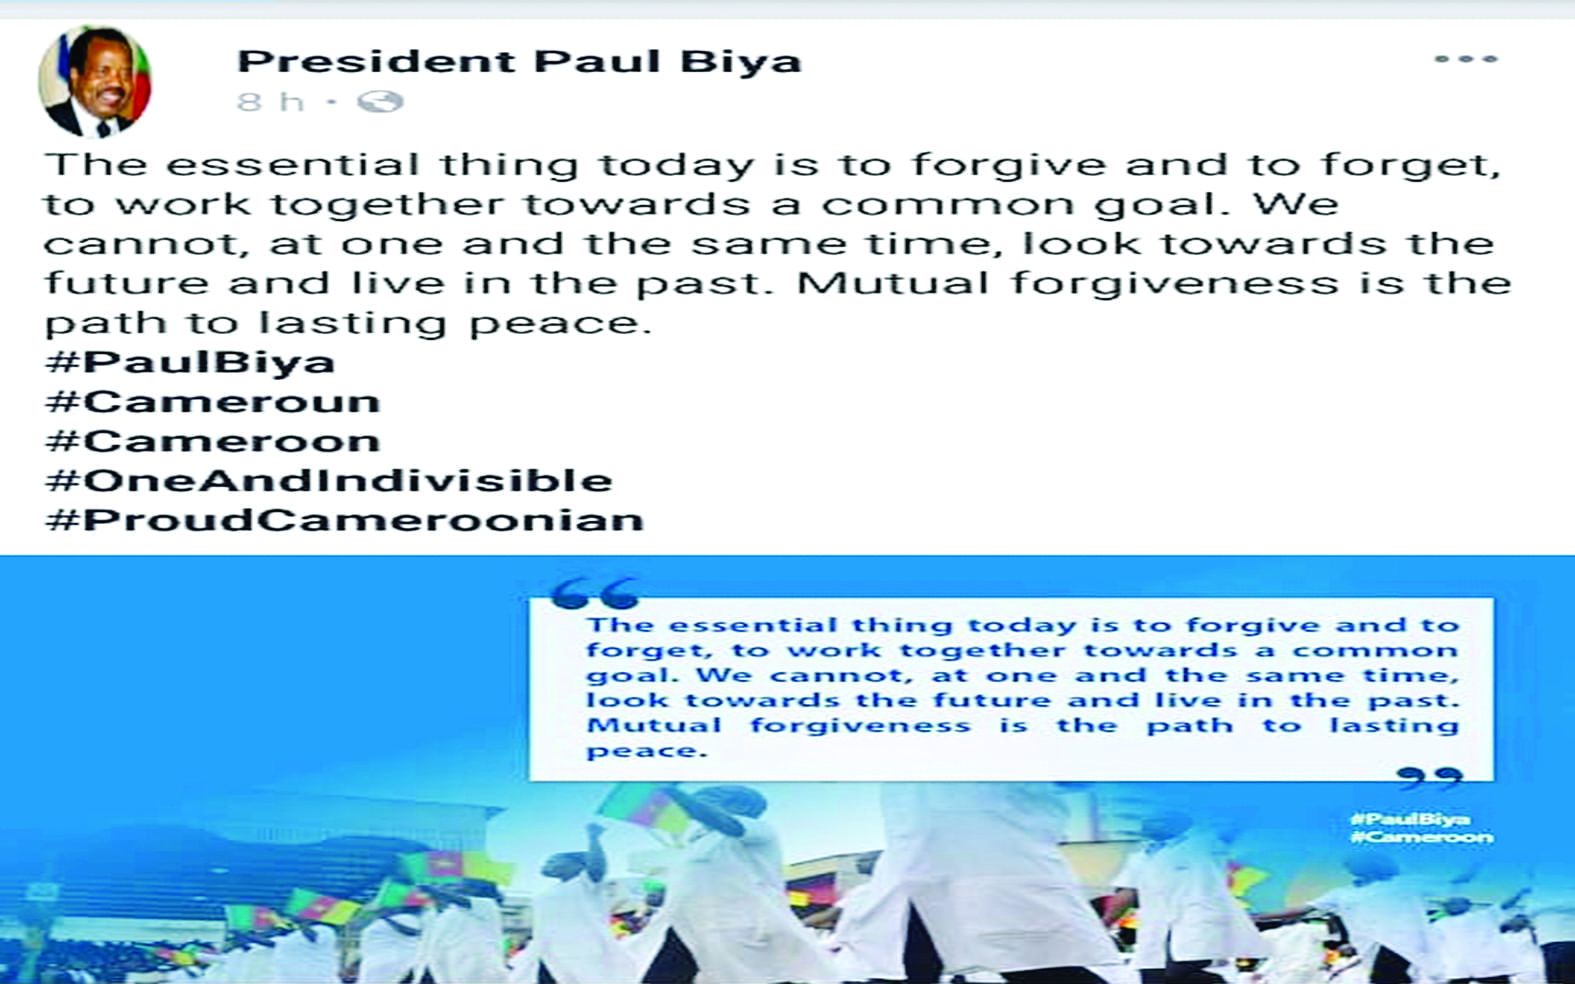 President Paul Biya Calls For Mutual Forgiveness